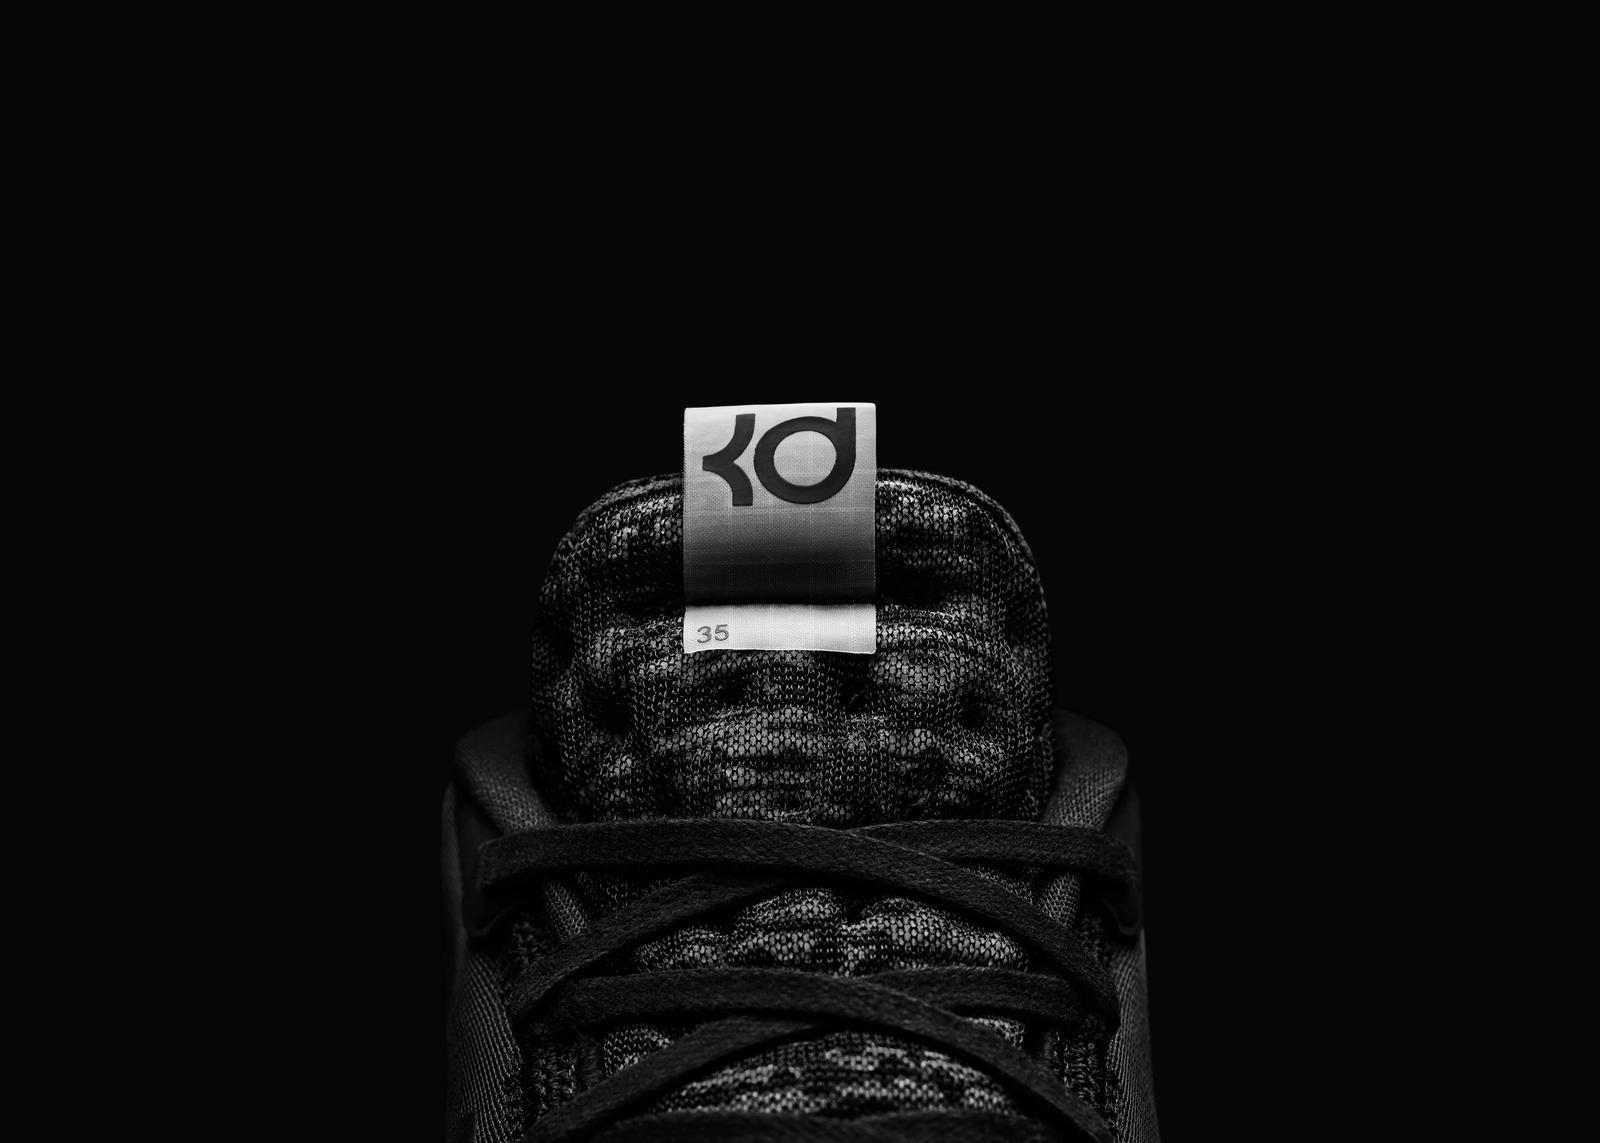 Nike-KD12-Assets-002_rectangle_1600.jpg